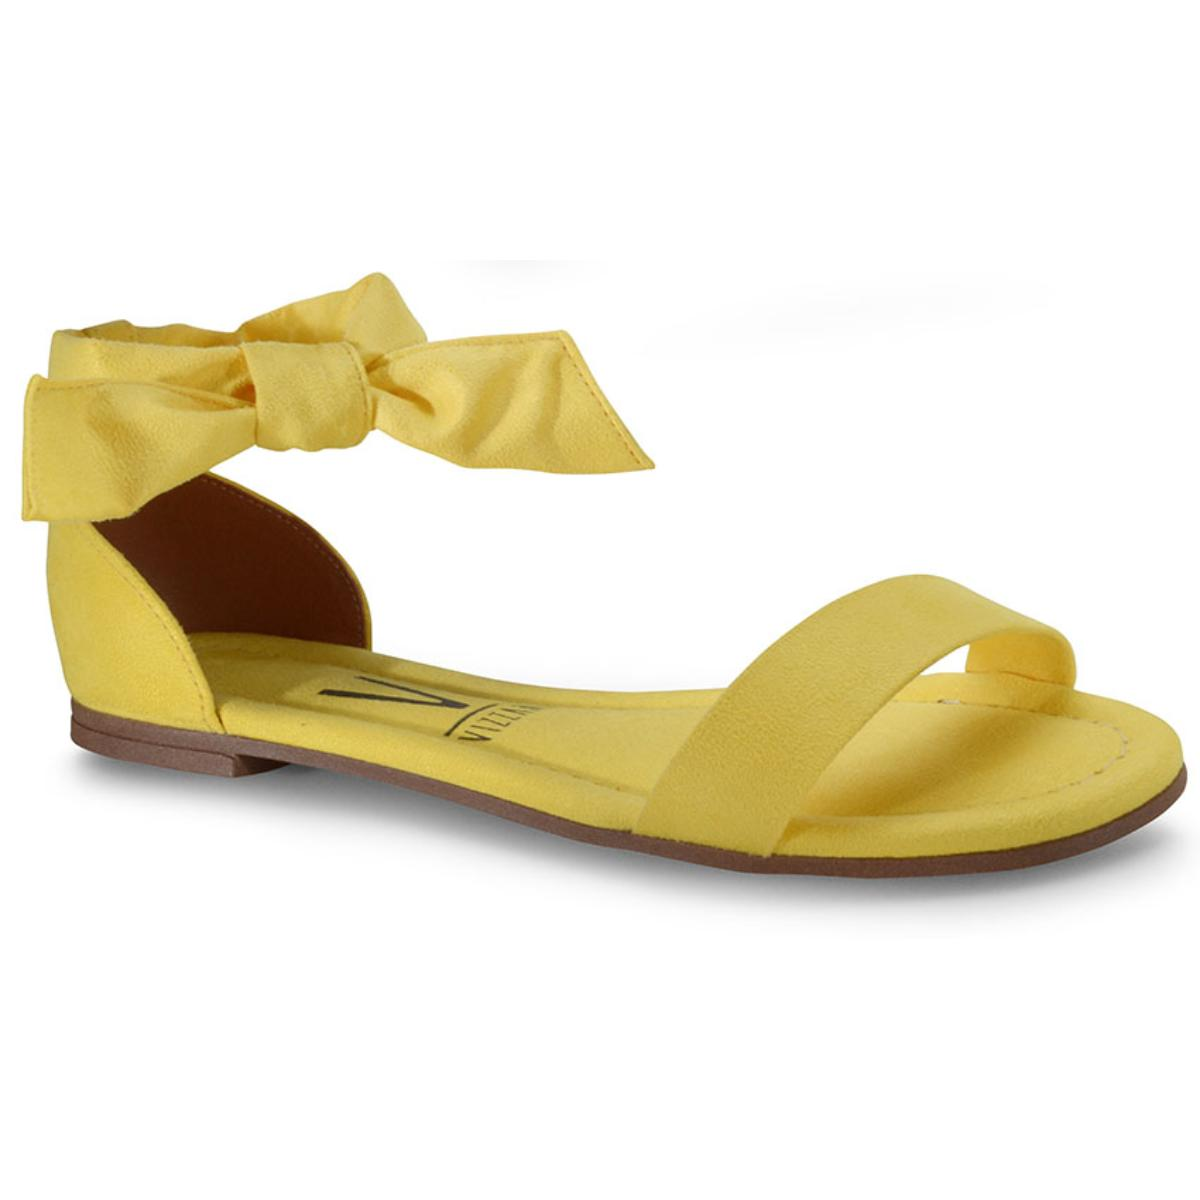 Sandália Feminina Vizzano 6235297 Amarelo